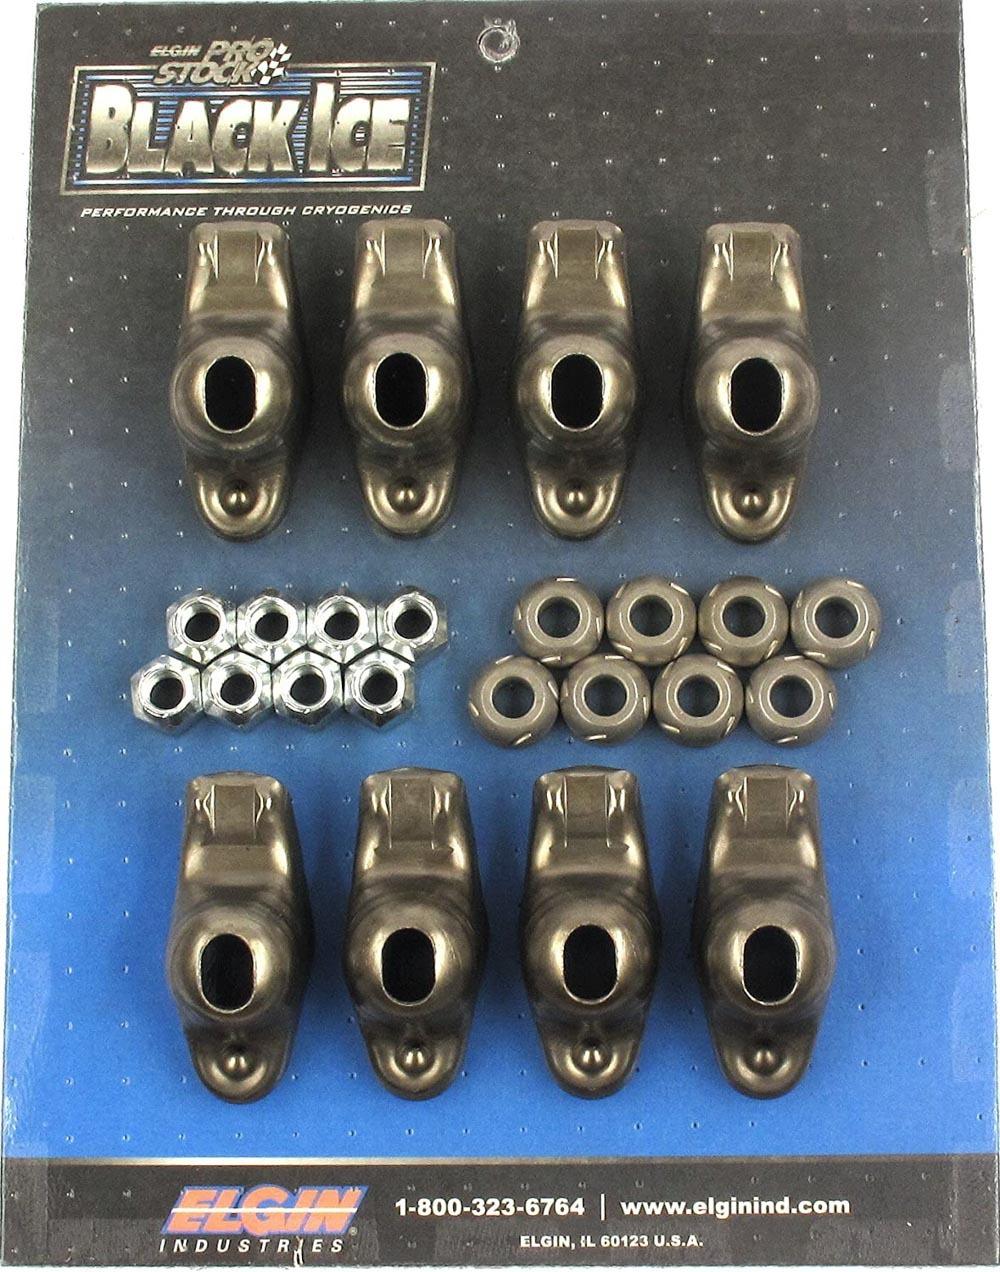 Elgin ICE410738 Rocker Arm, Black Ice, 3/8 in Stud Mount, 1.60 Ratio, OEM / Long Slot, Steel, Small Block Chevy, Set of 8